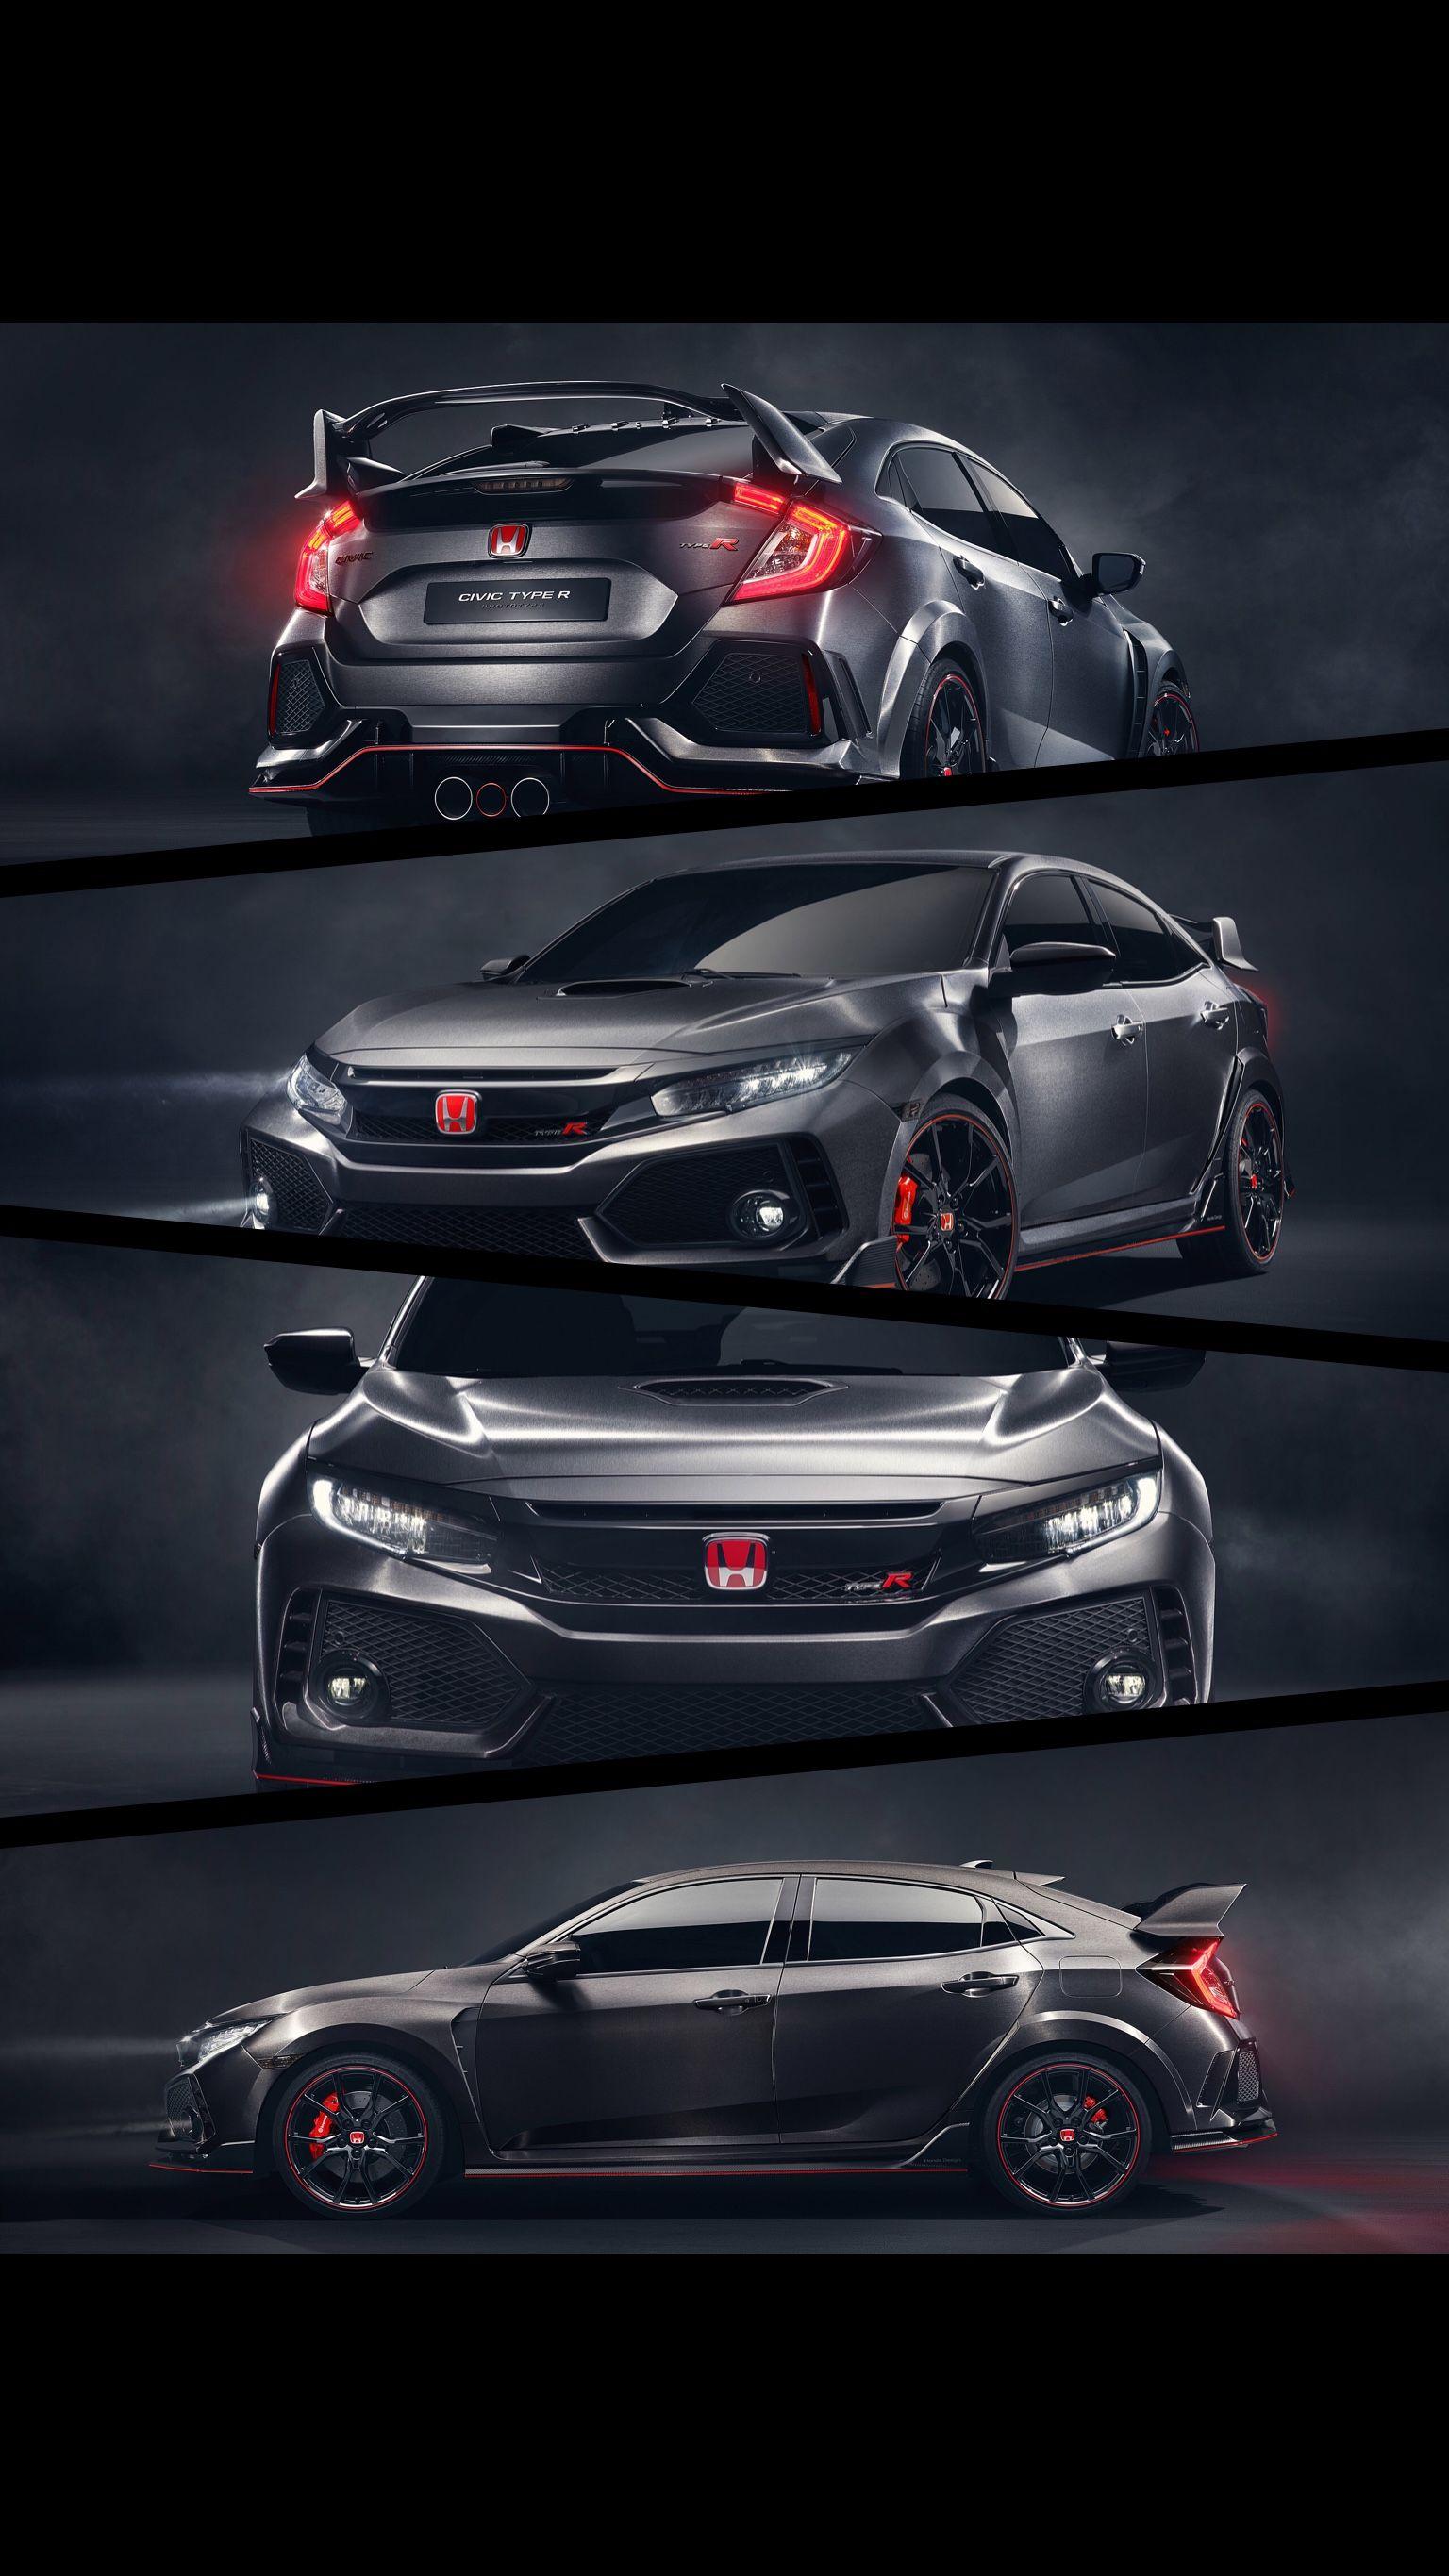 Black Honda Civic HD desktop wallpaper Widescreen High